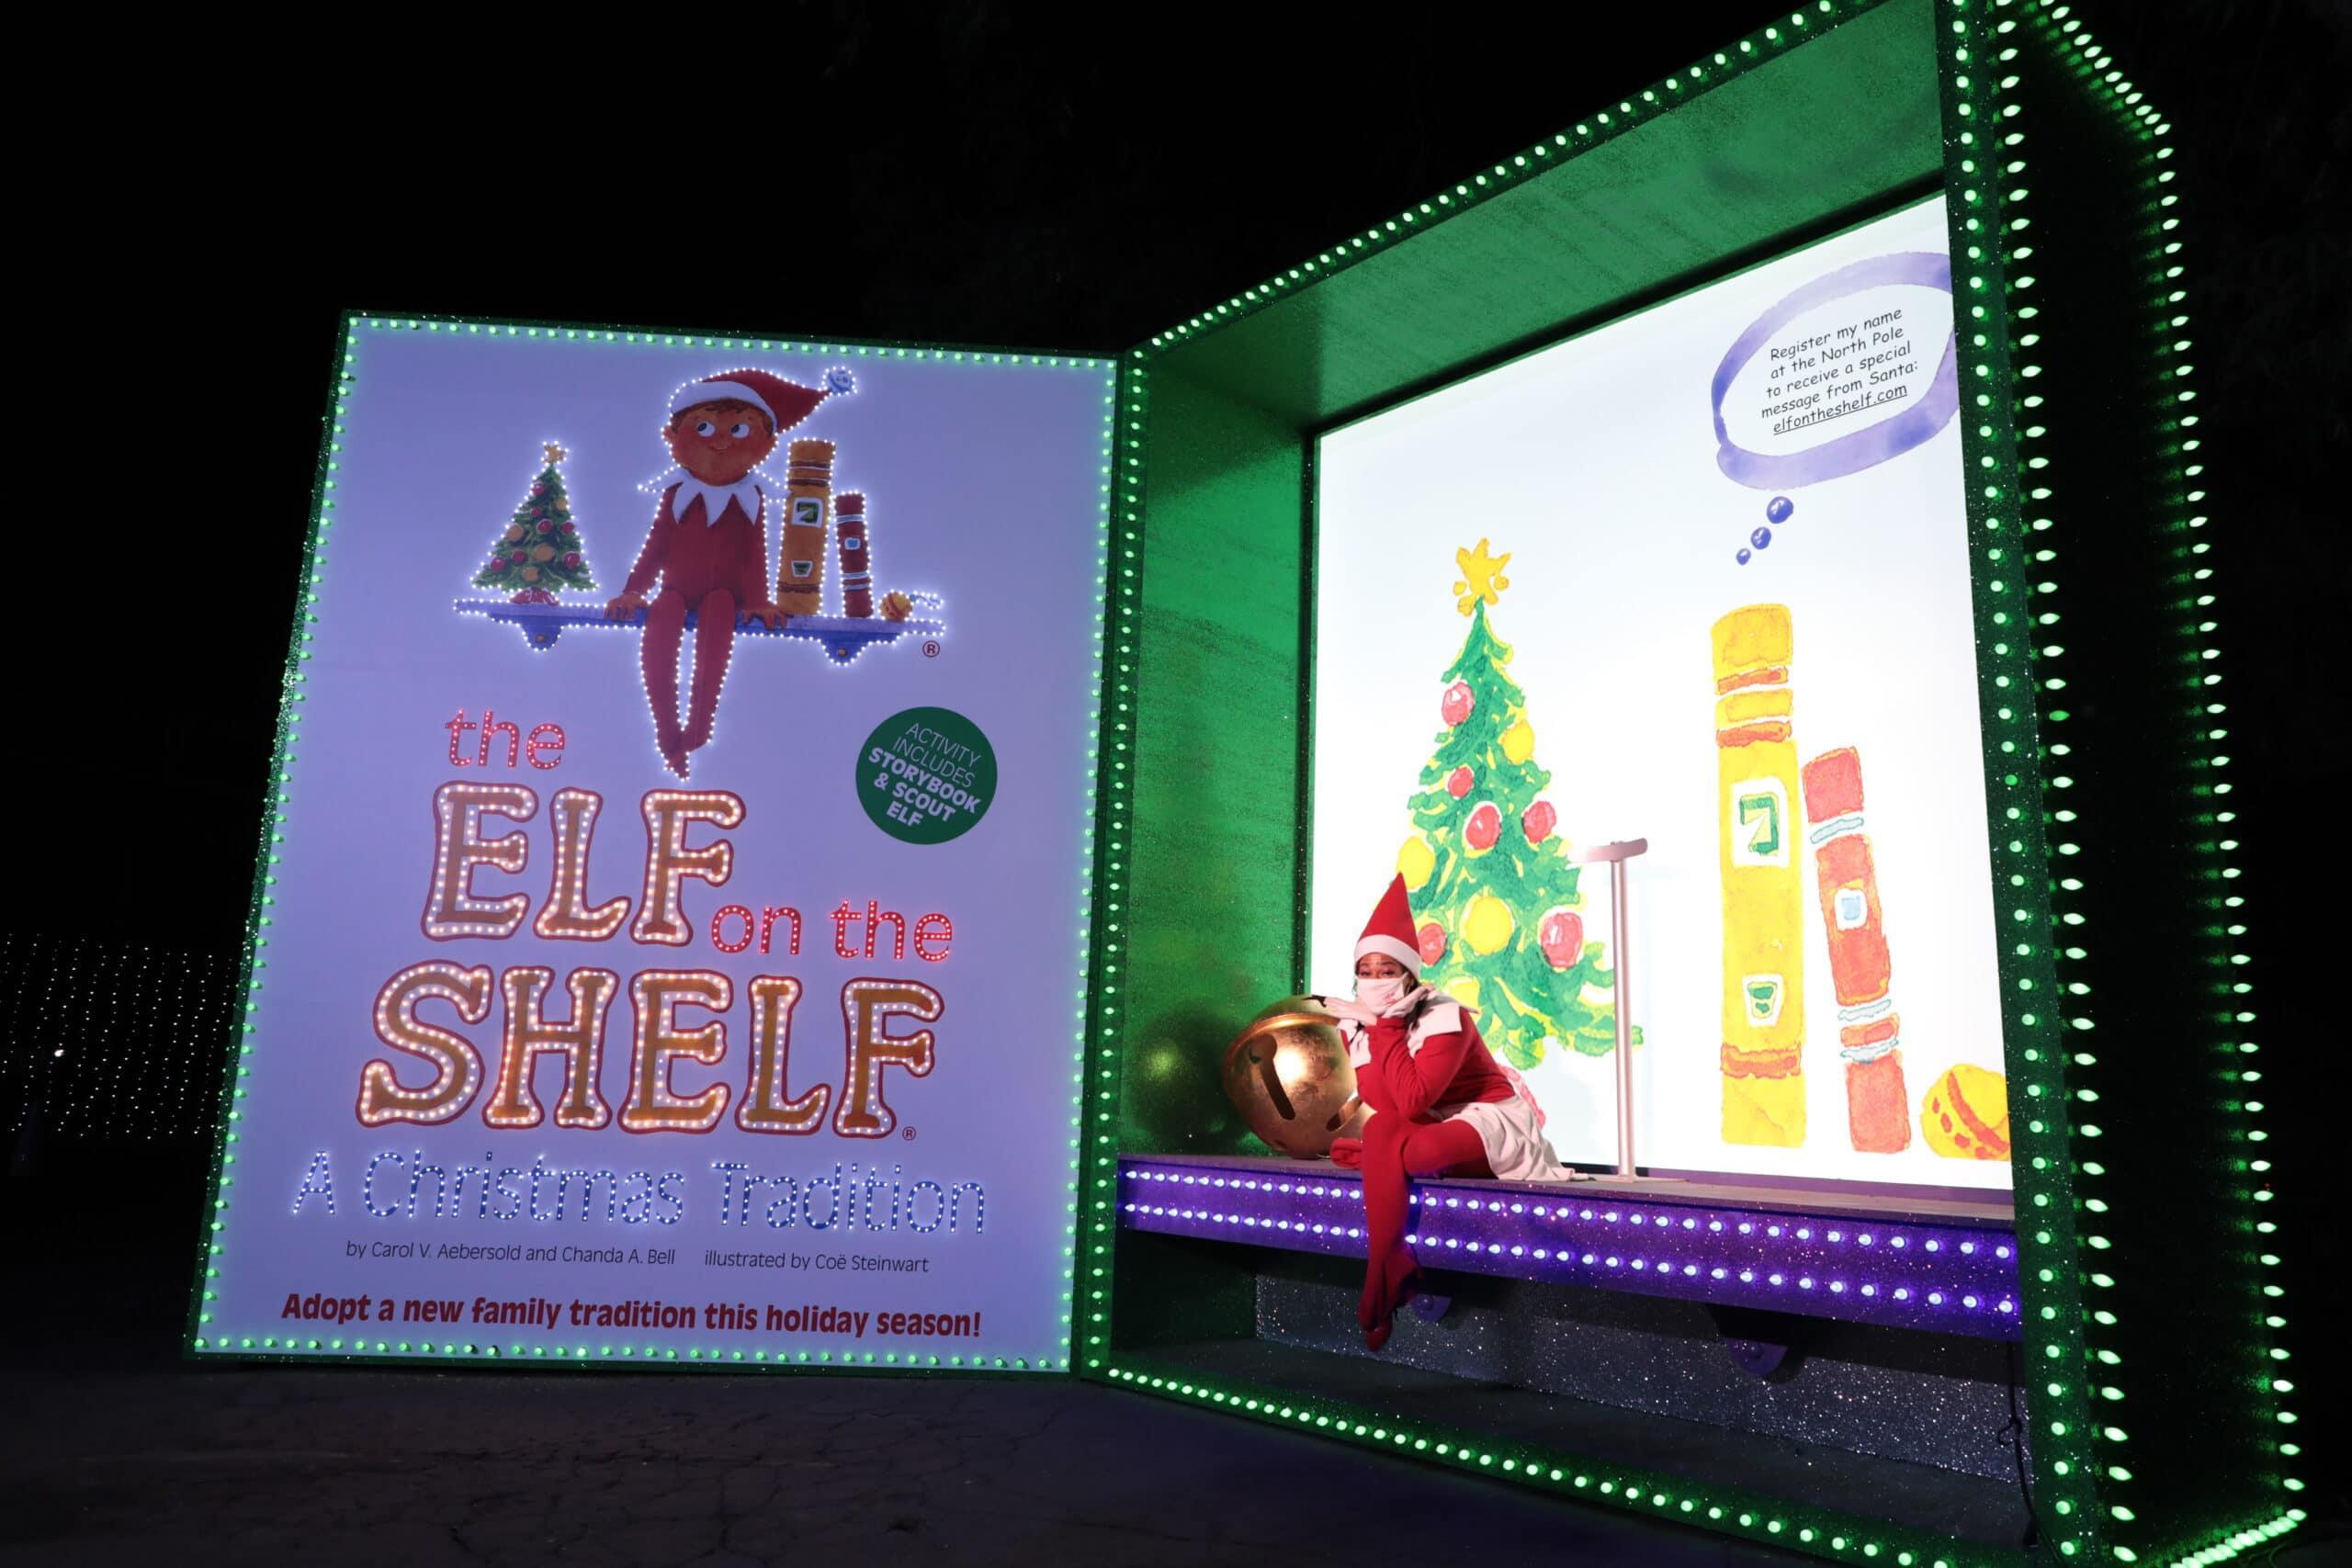 Elf on the Shelf production